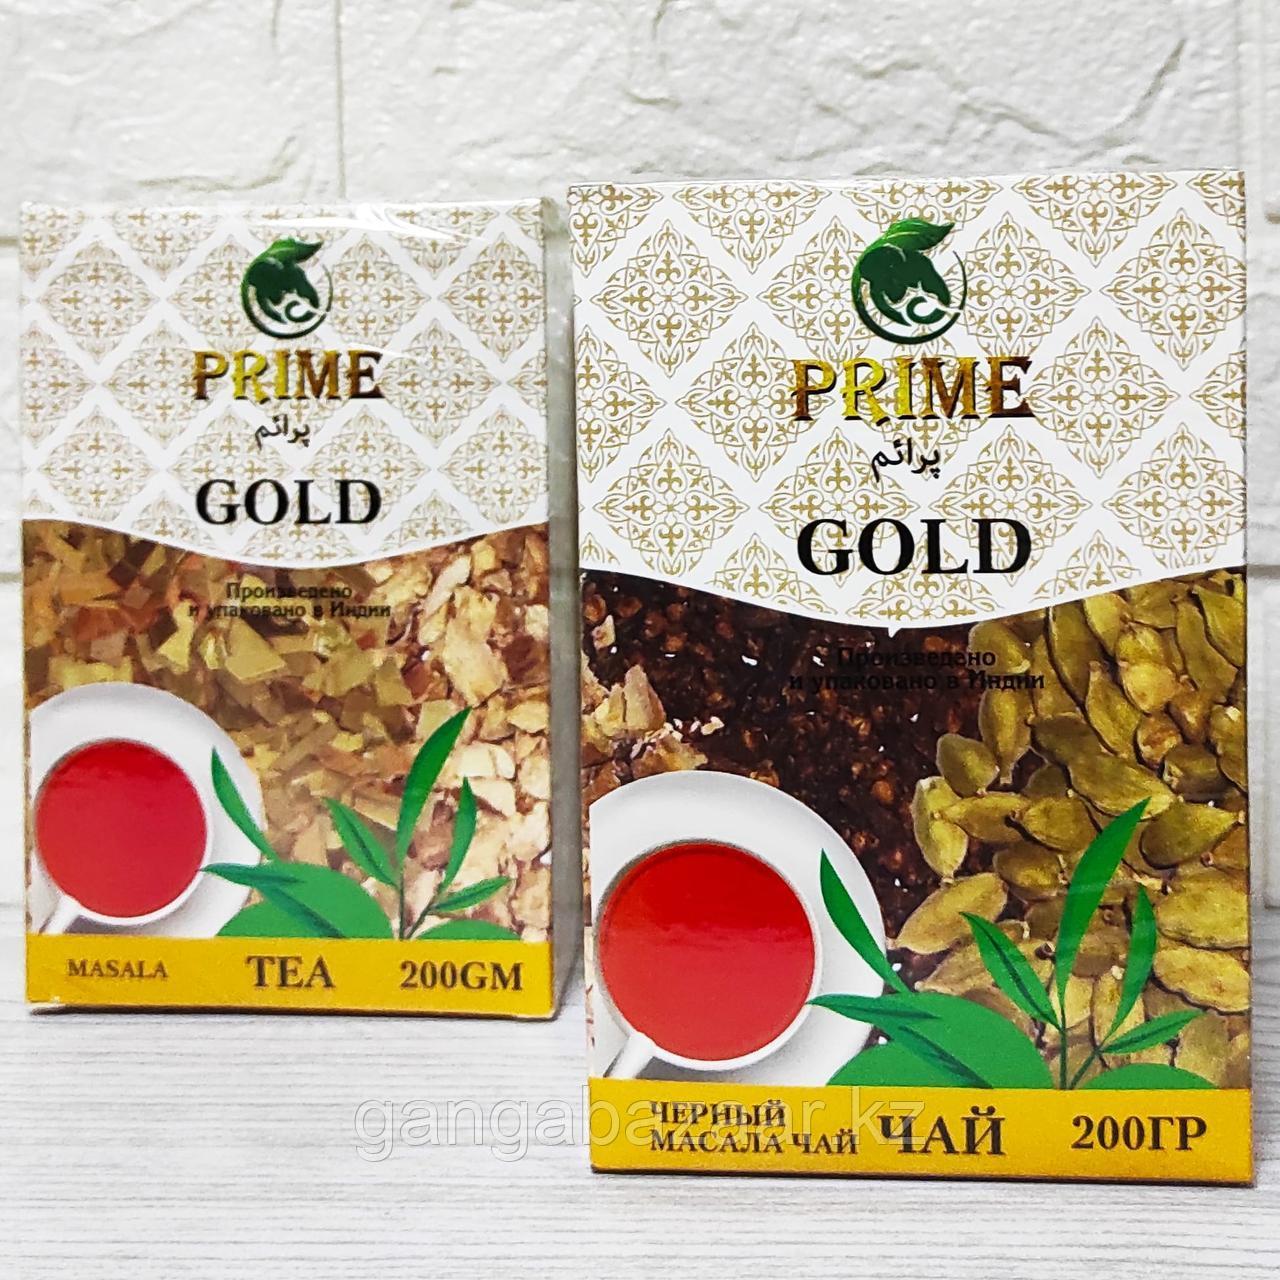 Масала чай Голд Прайм с имбирем, кардамоном, гвоздикой, 200 гр